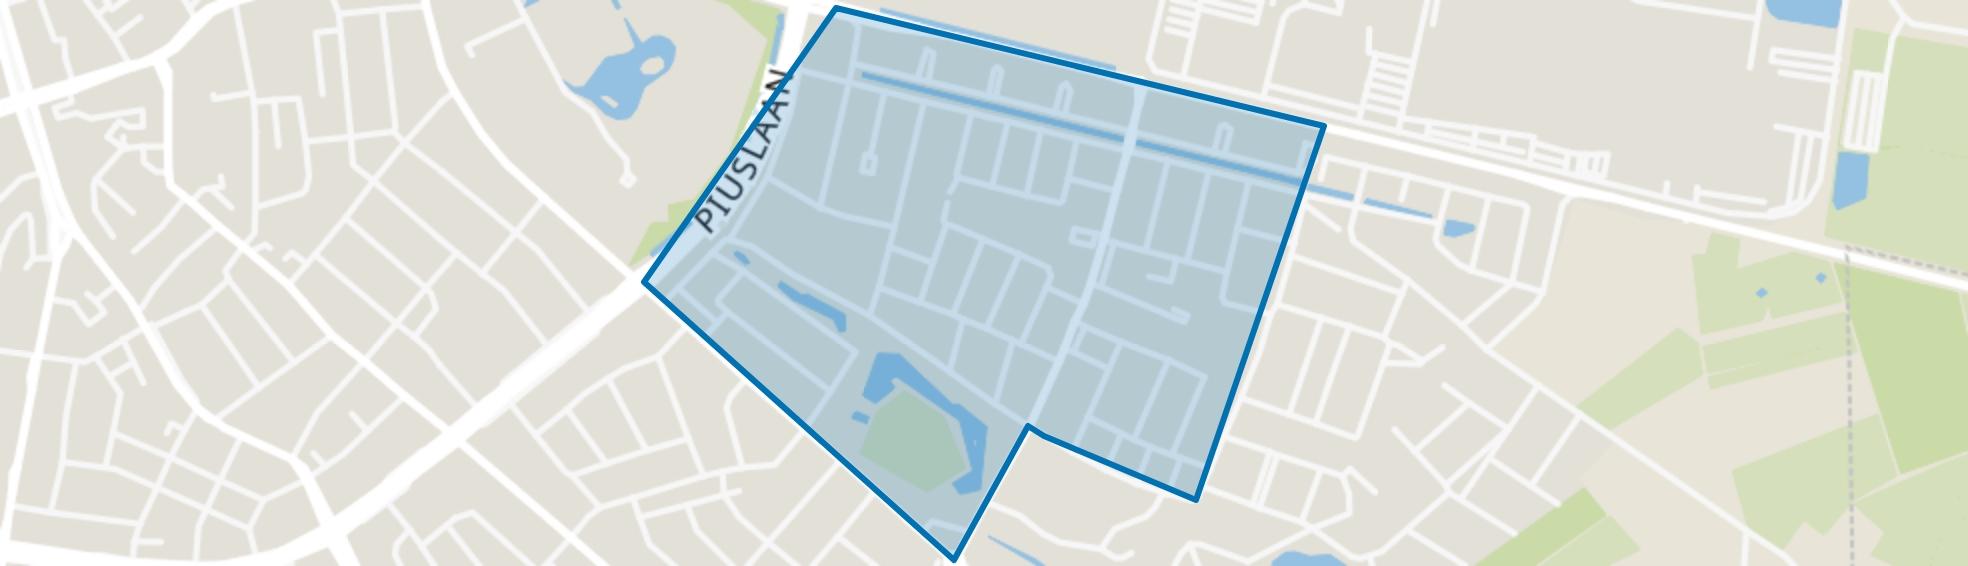 Burghplan, Eindhoven map